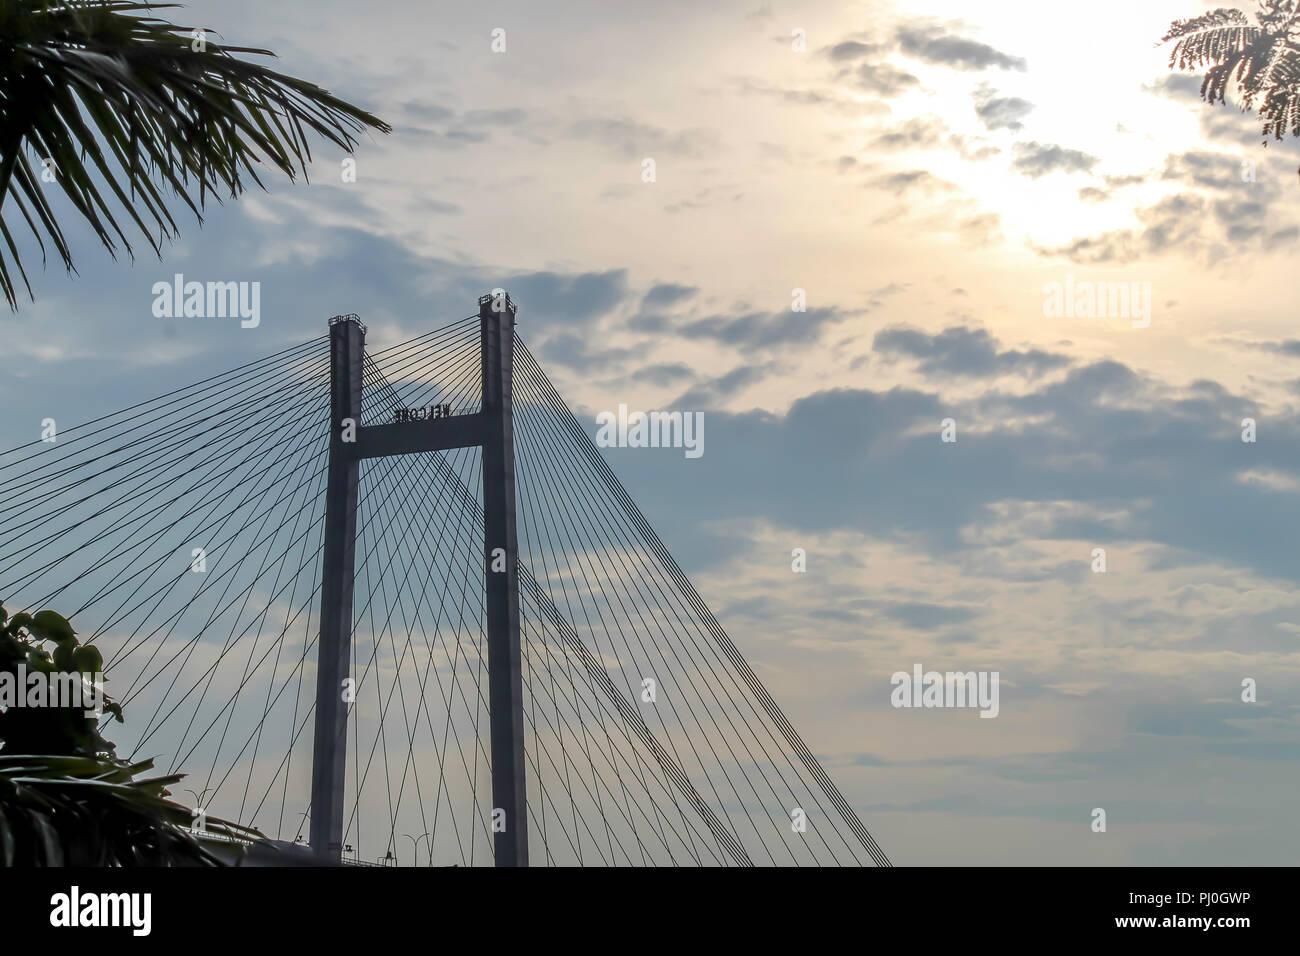 Second Howrah bridge - The historic cantilever bridge on the river Ganges. - Stock Image